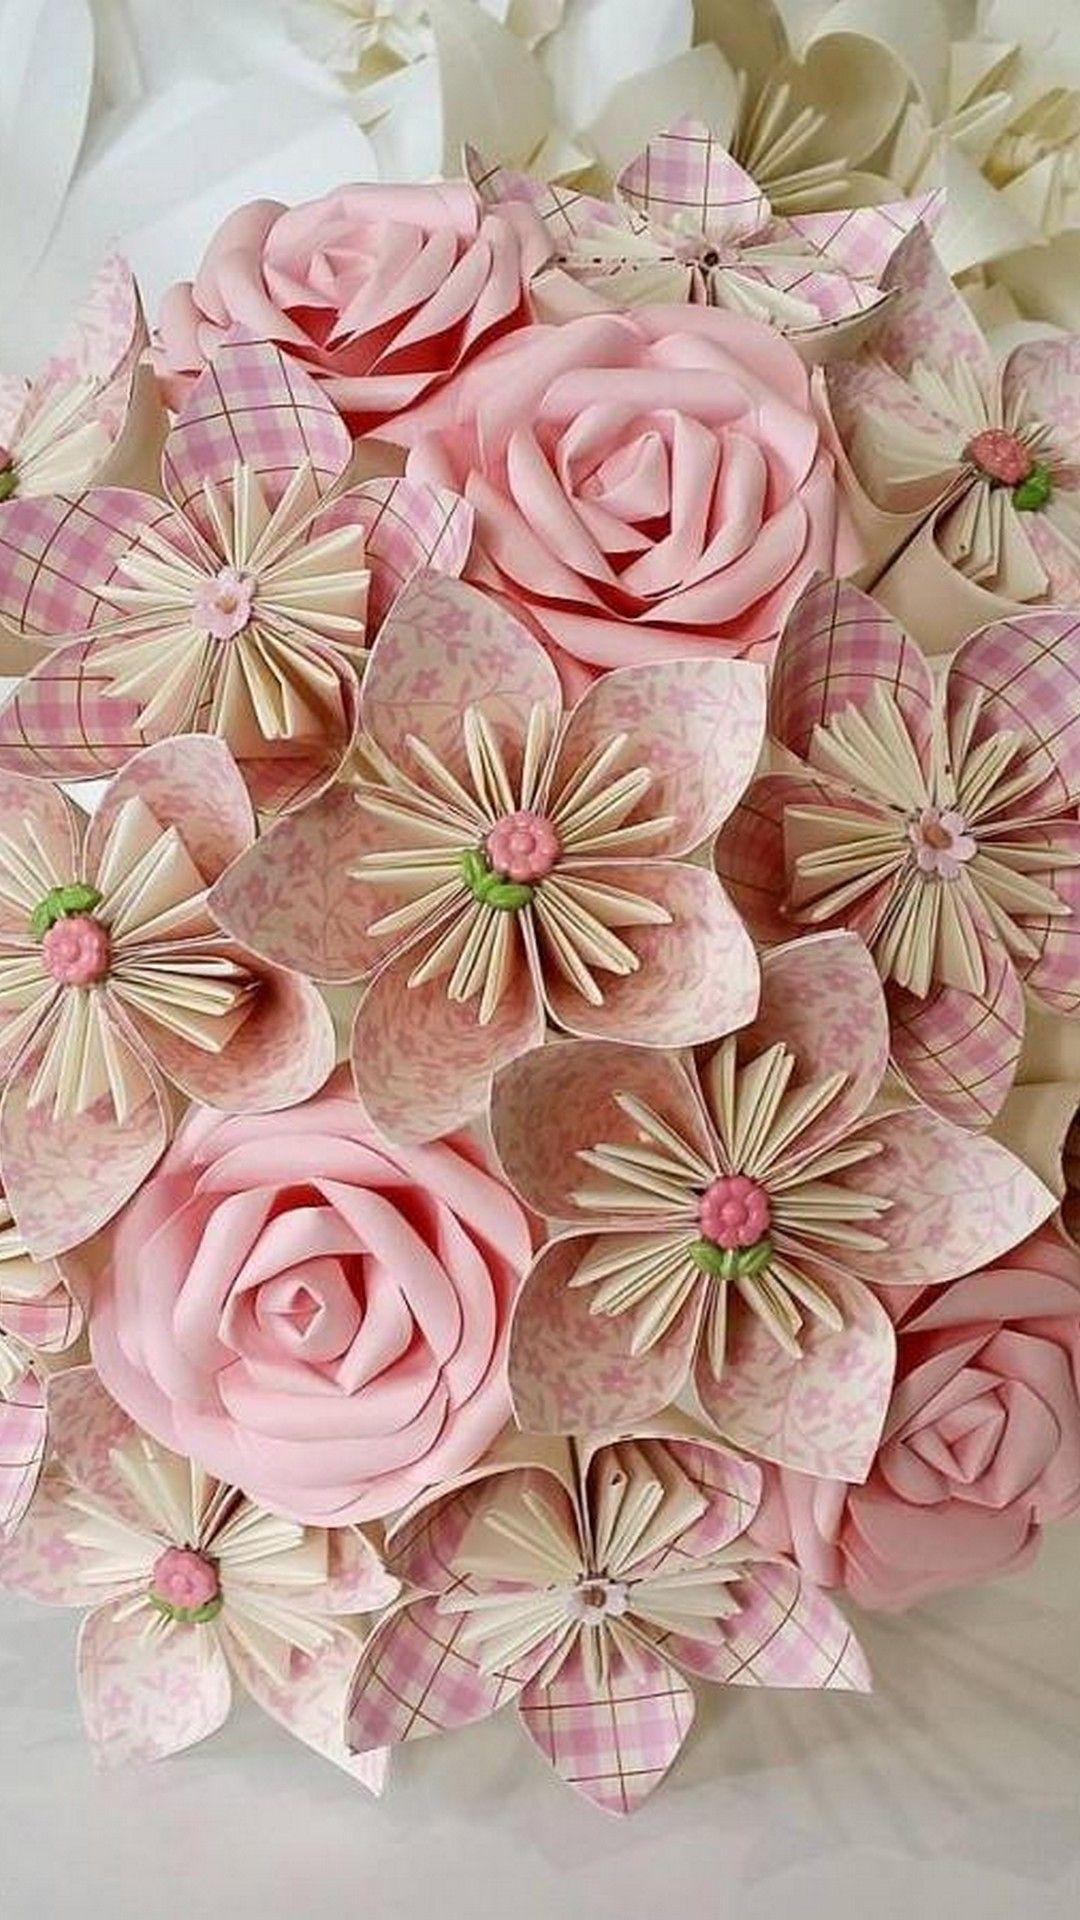 Pin by Pandora on Wallpaper Flower phone wallpaper